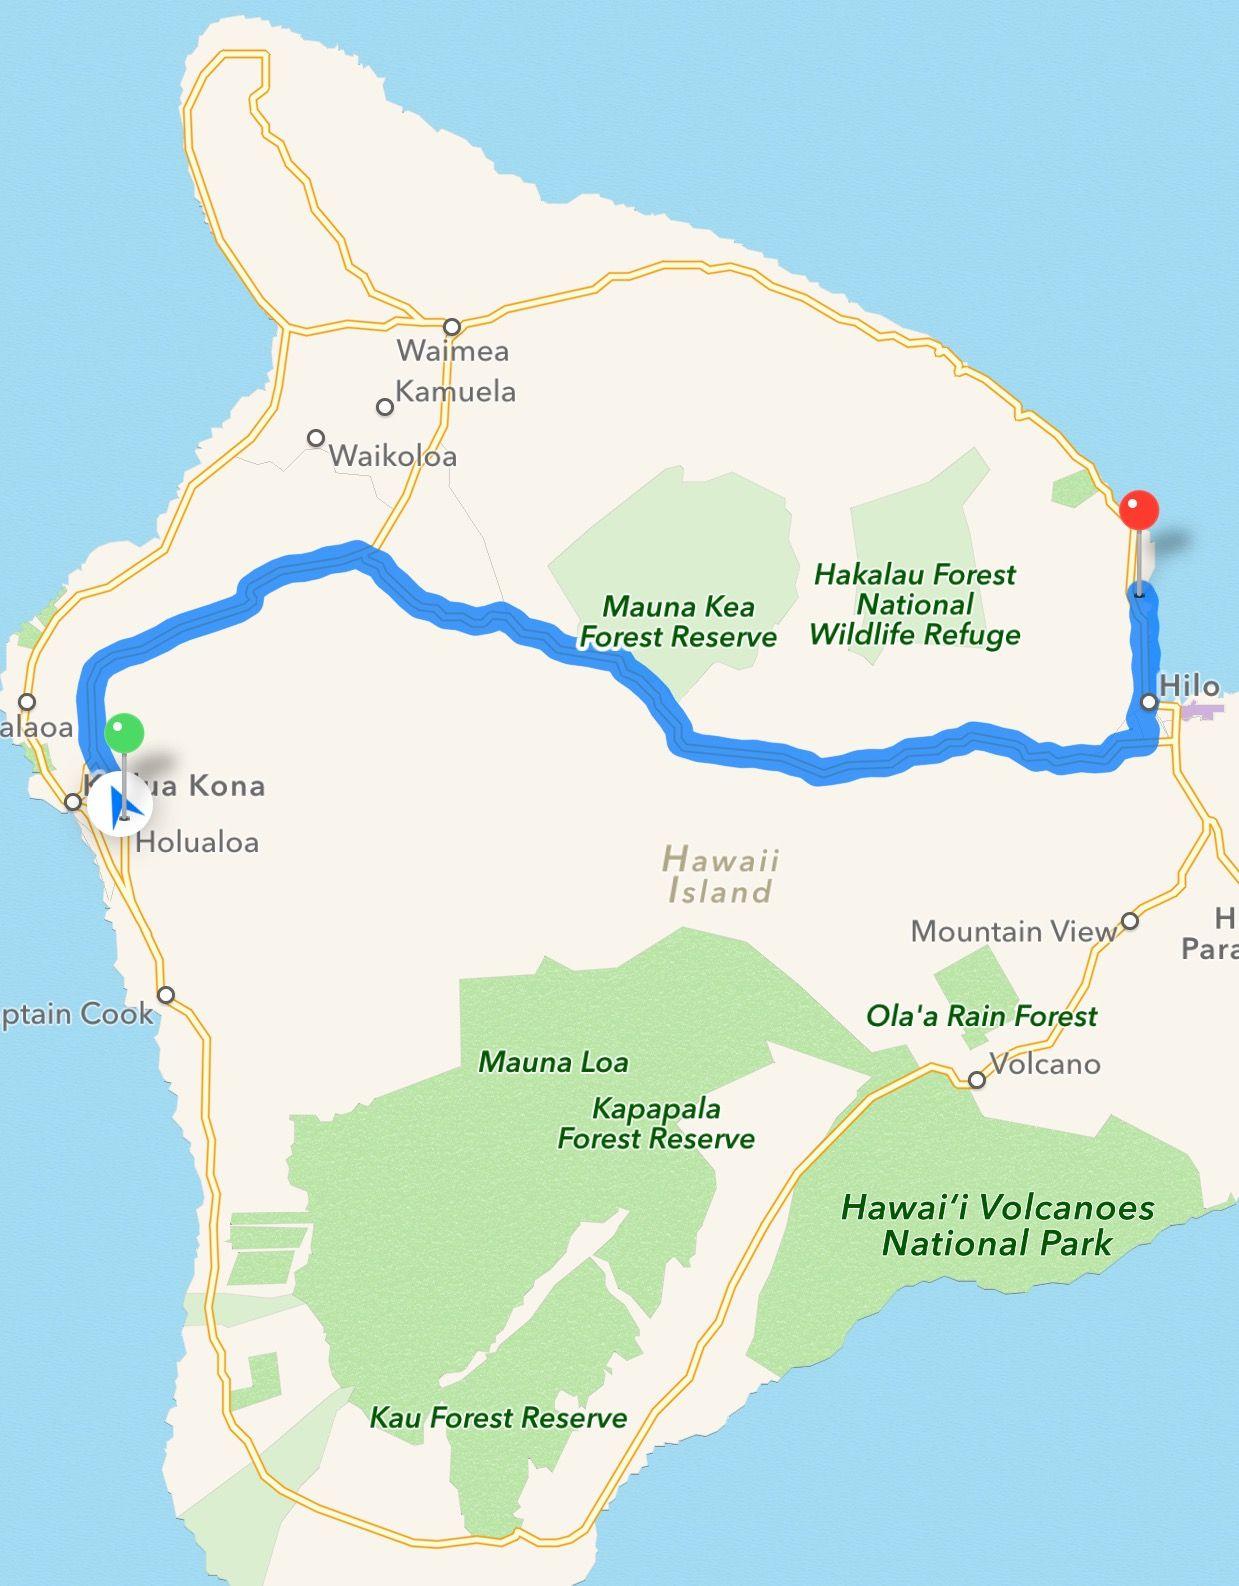 Road trip over the mountains to the other side of the island.   Our Kauai Map Of Kona Hawaii on kauai lihue hawaii, kauai hawaii beaches, snorkeling in hawaii, lava big island hawaii, kauai kona coffee,